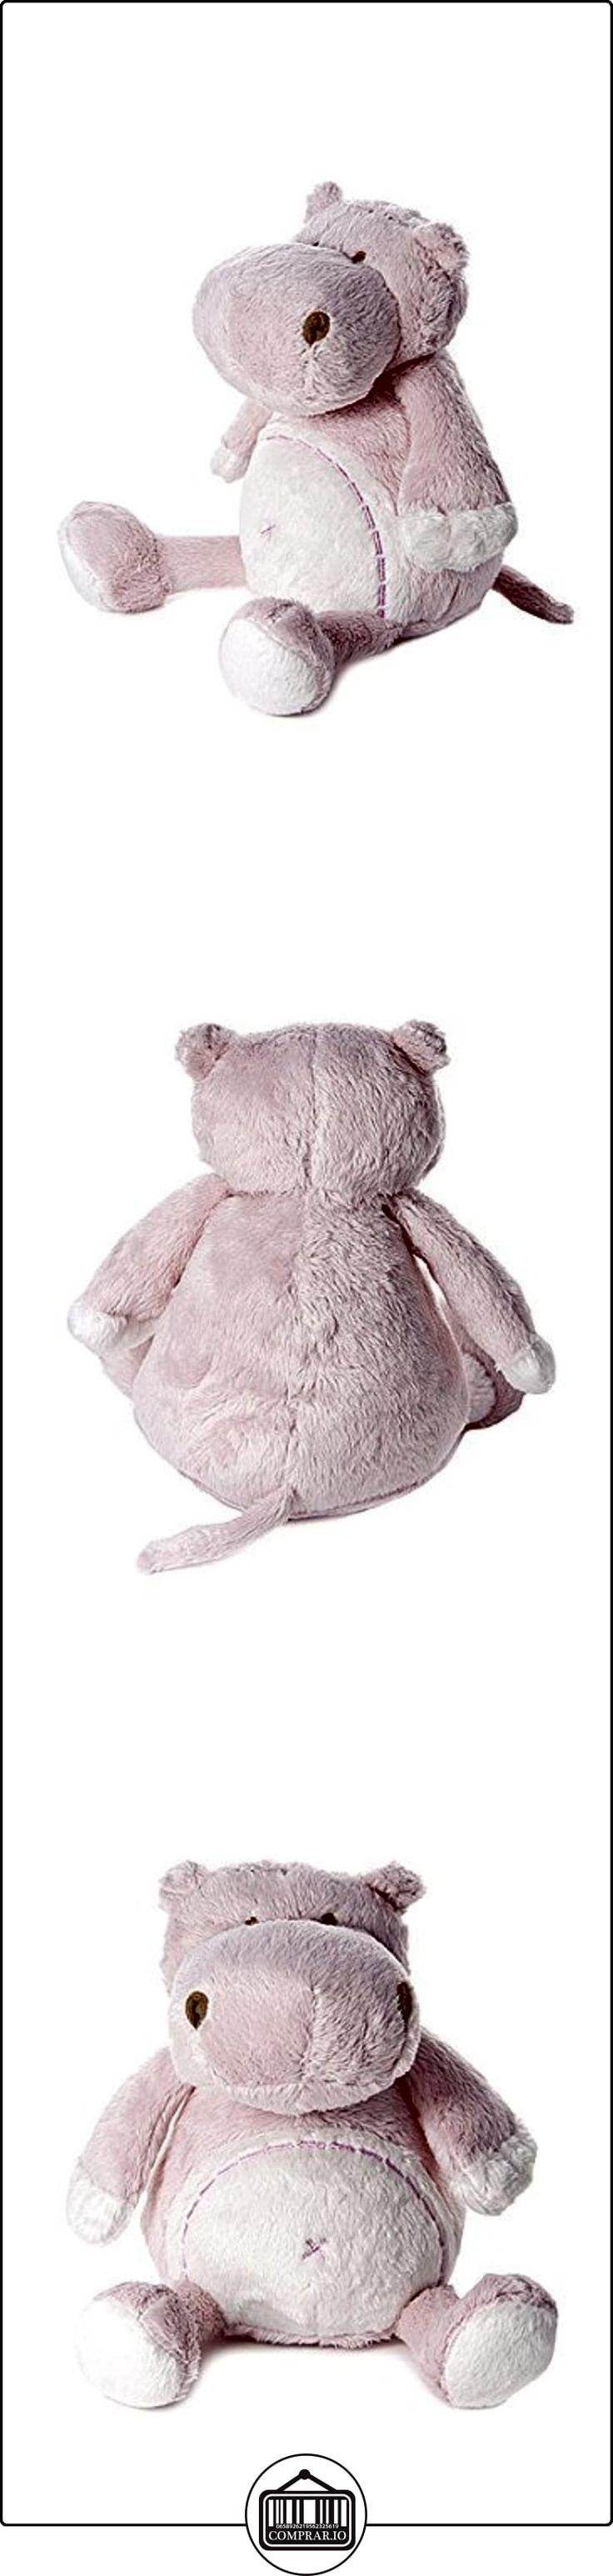 Suave hipopótamo de peluche juguetes blandos rosa para niñas recién nacidas  ✿ Regalos para recién nacidos - Bebes ✿ ▬► Ver oferta: http://comprar.io/goto/B00PDINCSQ